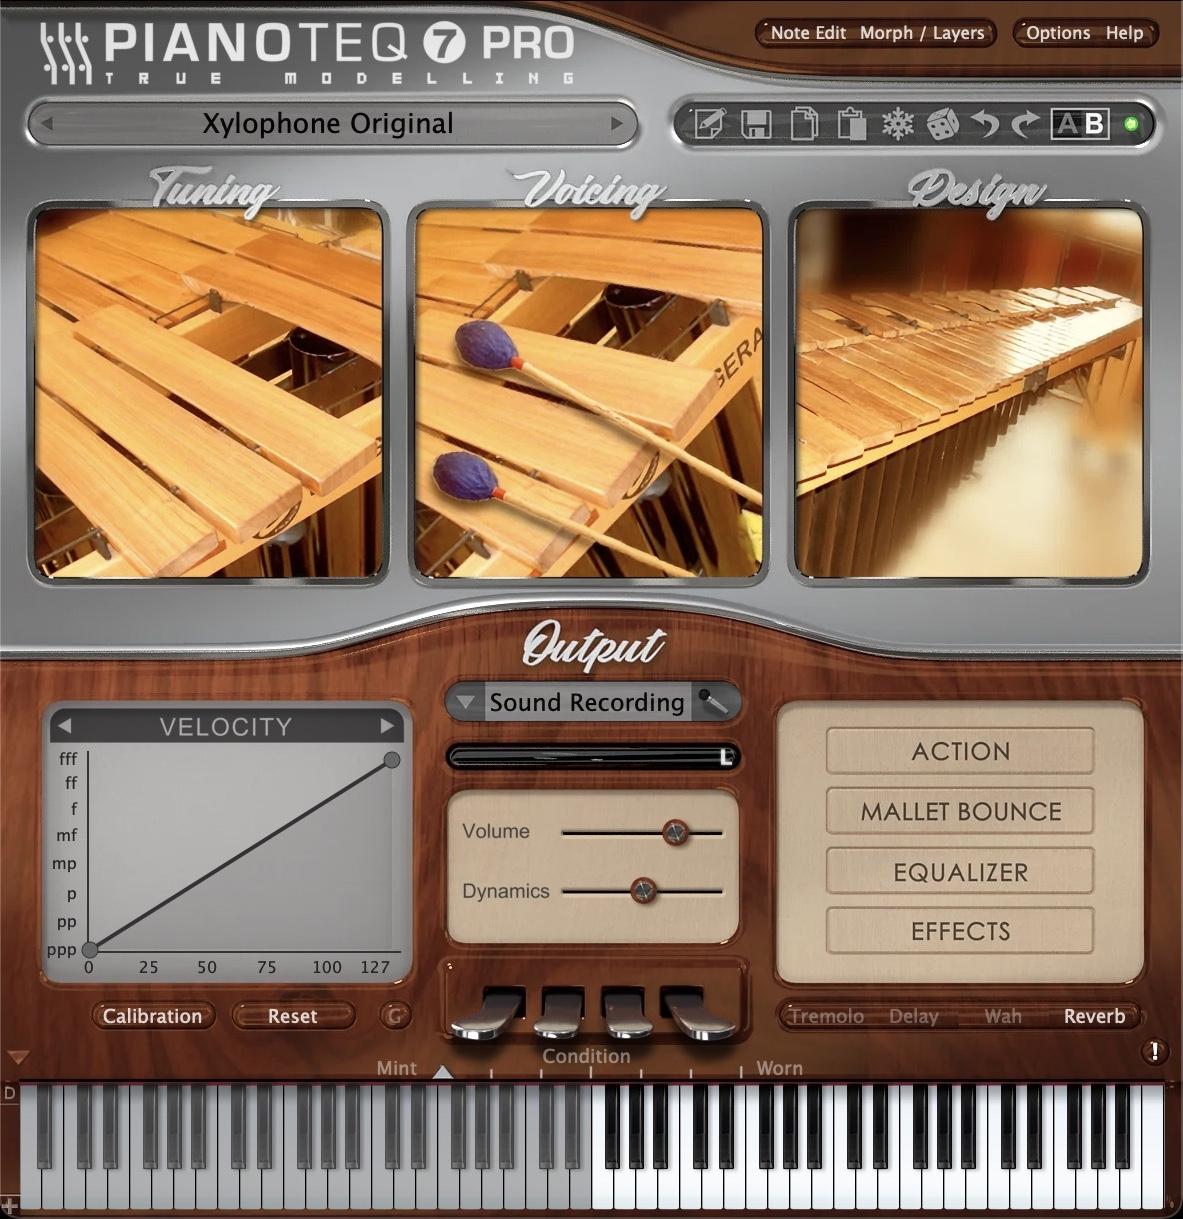 Pianoteq - Xylo: Marimba bass & Xylophone